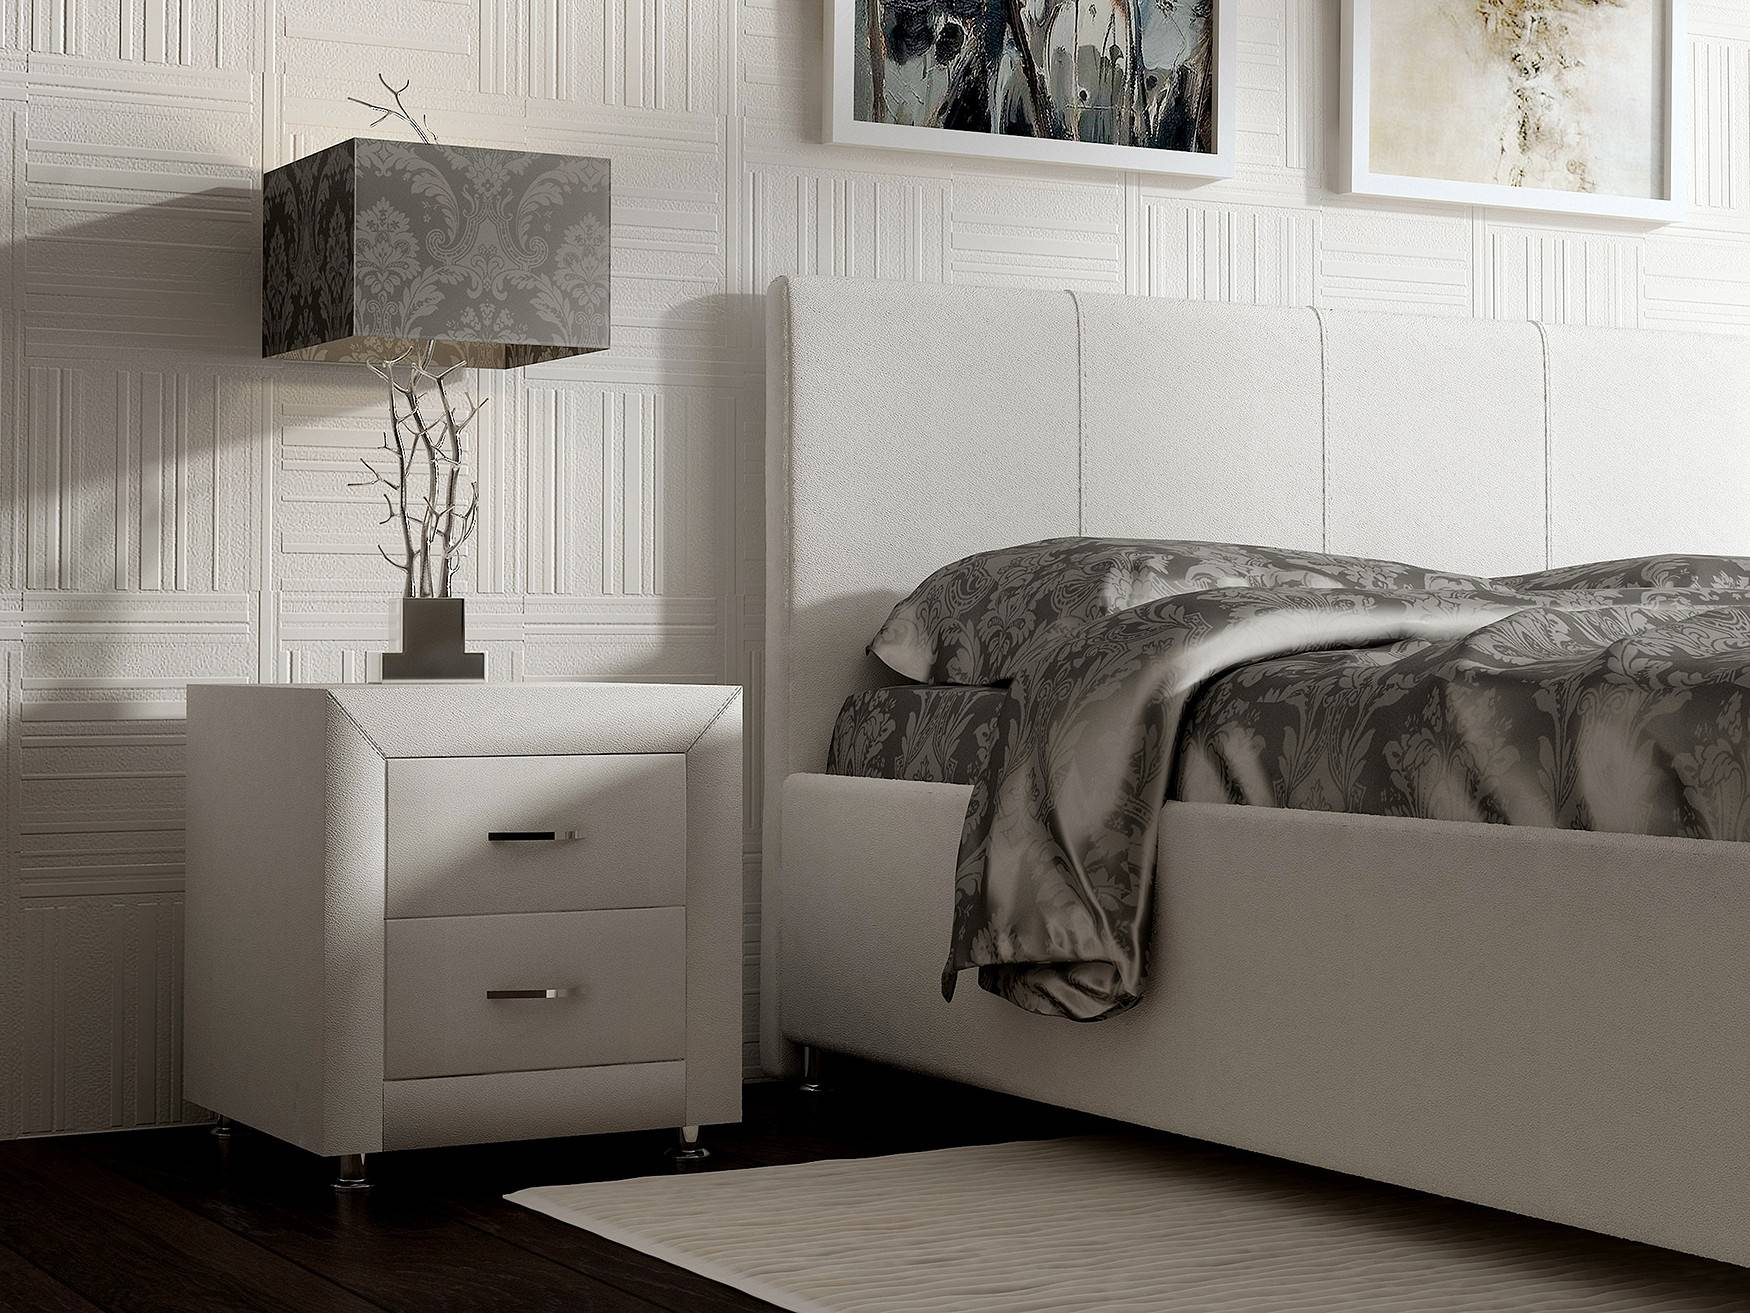 Стандартные размеры прикроватных тумб для спальных комнат